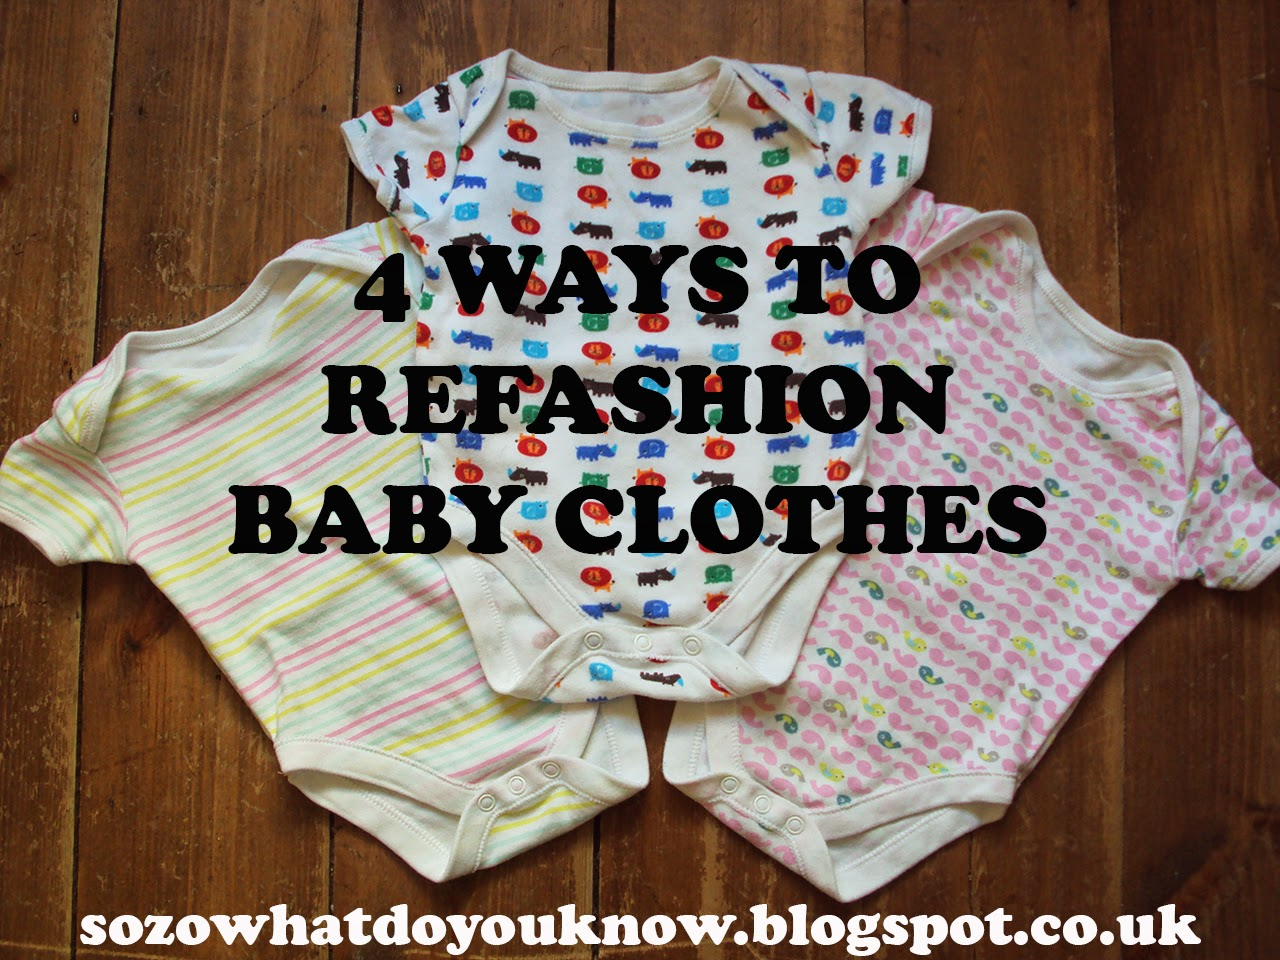 So Zo Refashion Friday 4 Ways To Refashion Baby Clothes